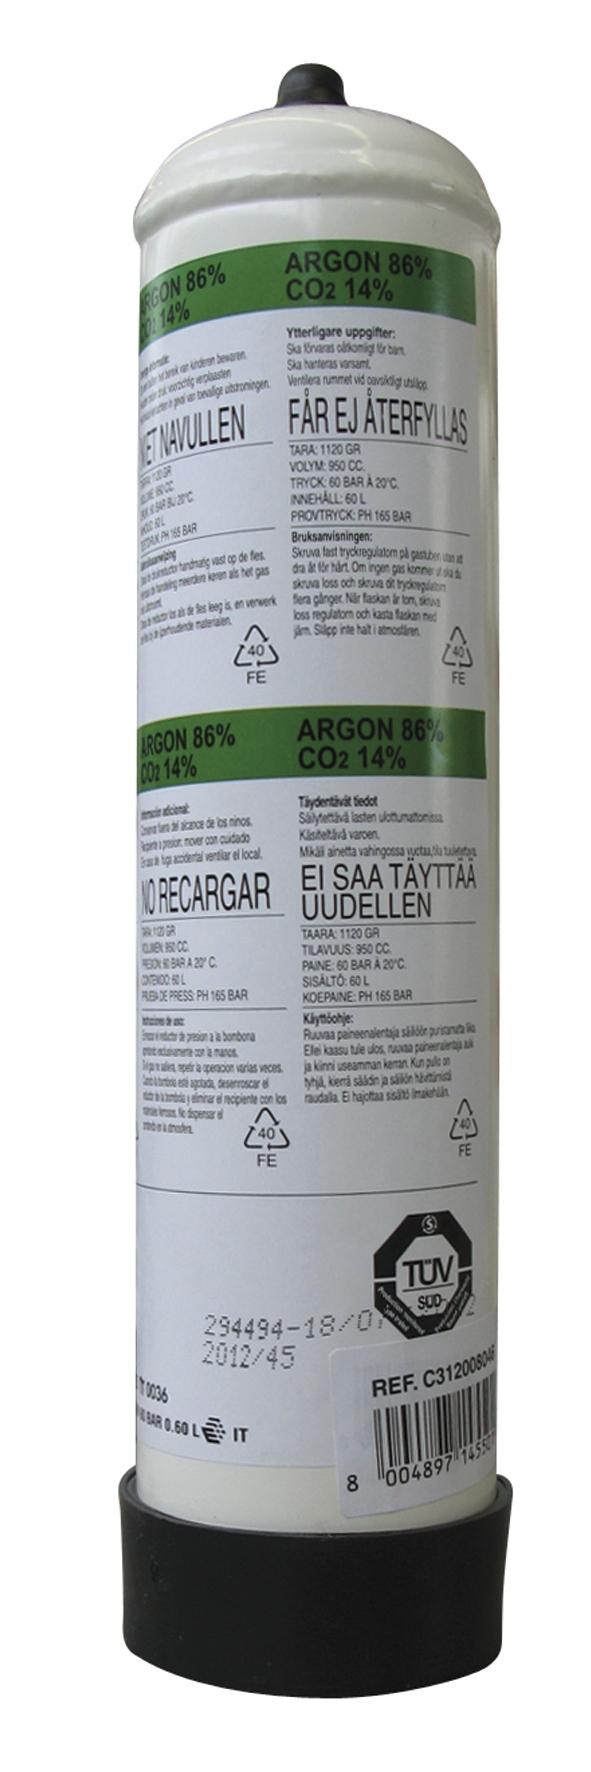 WEGWERPFLES 86% ARGON14% CO2 INH. 950CC